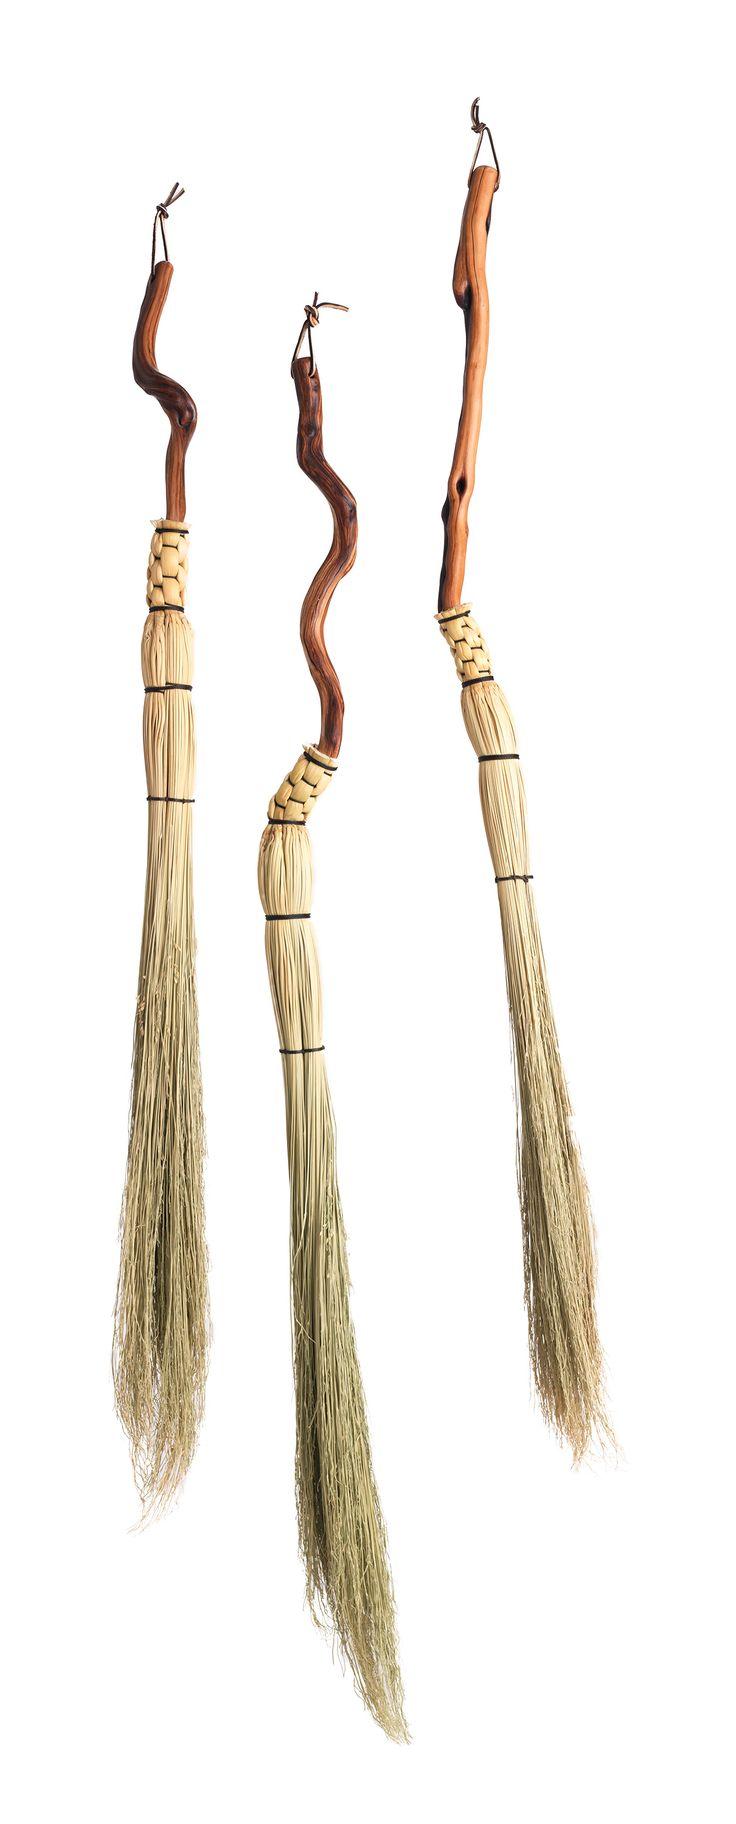 manzanita handle cobwebber brooms manzanita brooms pinterest